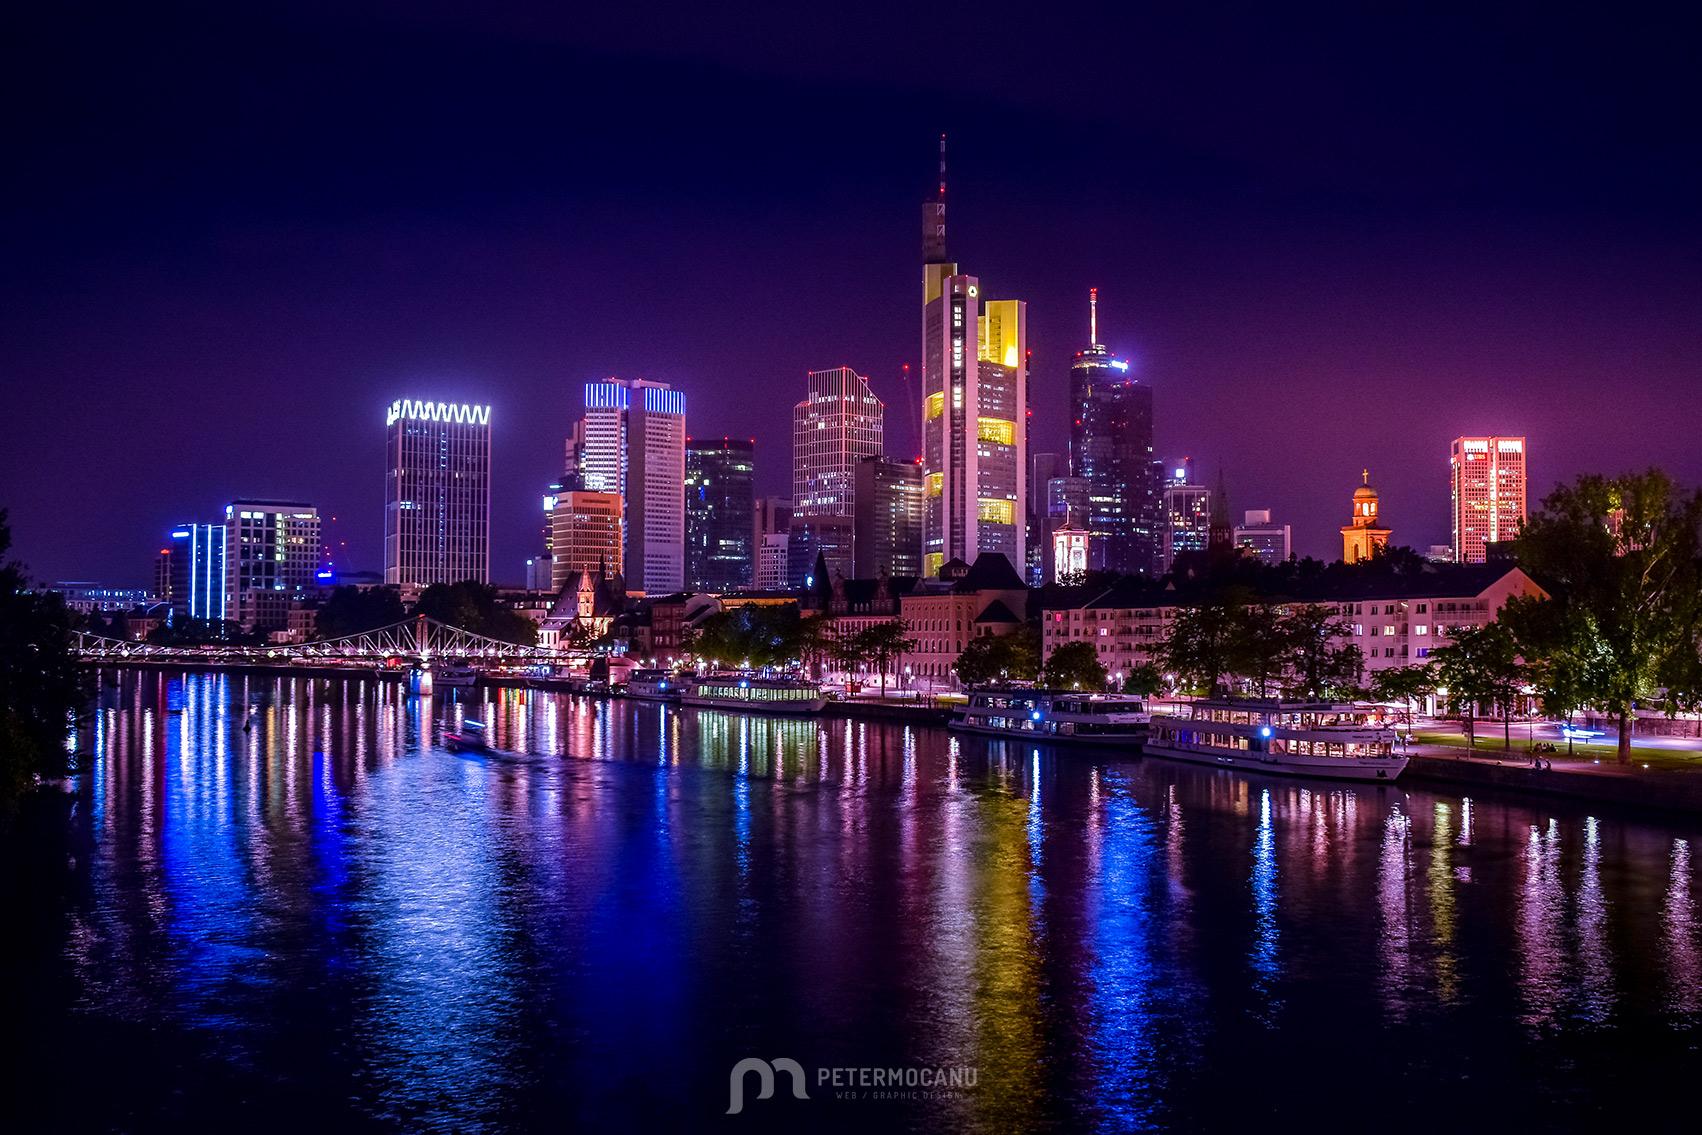 Skyline of Frankfurt am Main by night